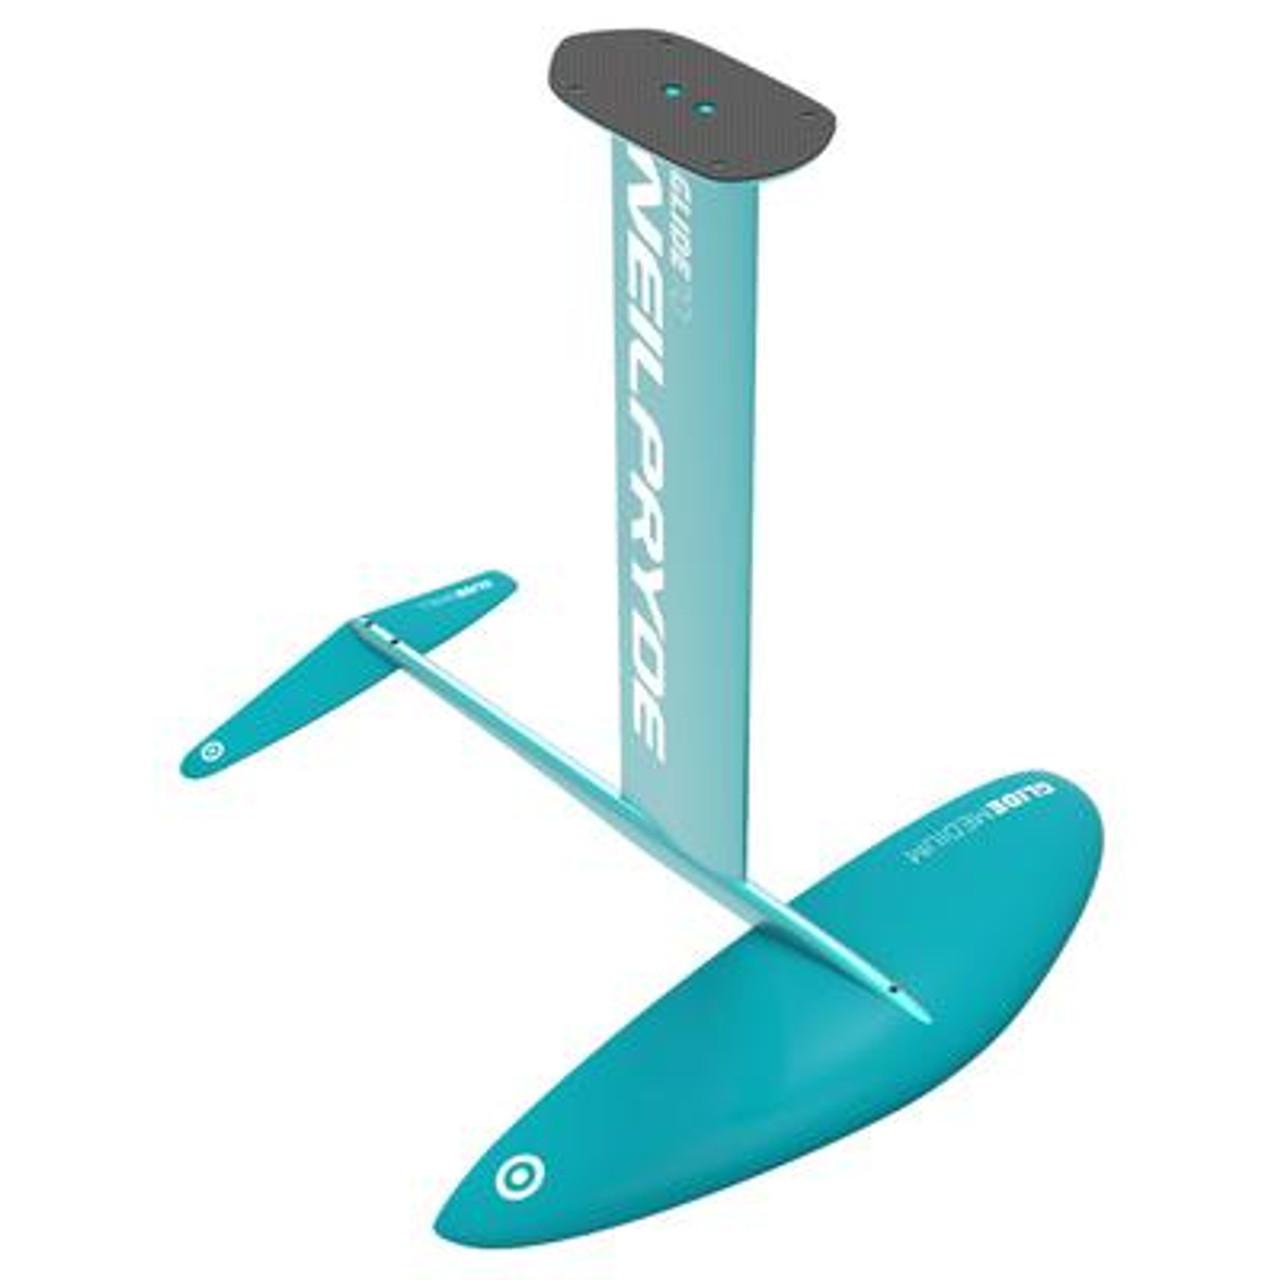 NeilPryde Glide Surf Medium 75cm